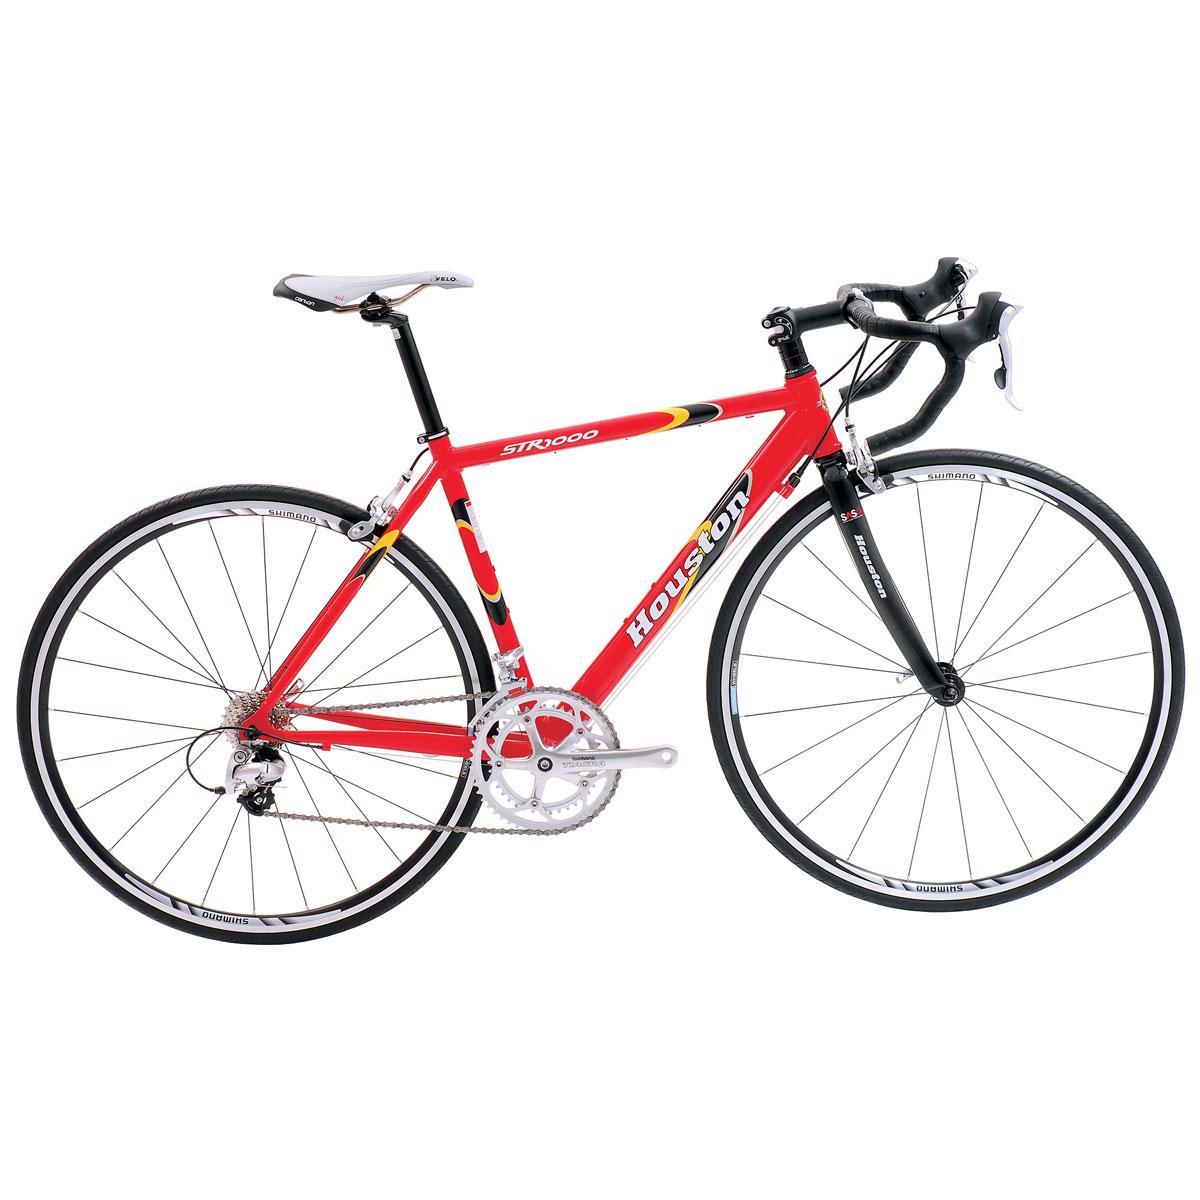 Bicicleta Houston STR 1000: indicado para performance;